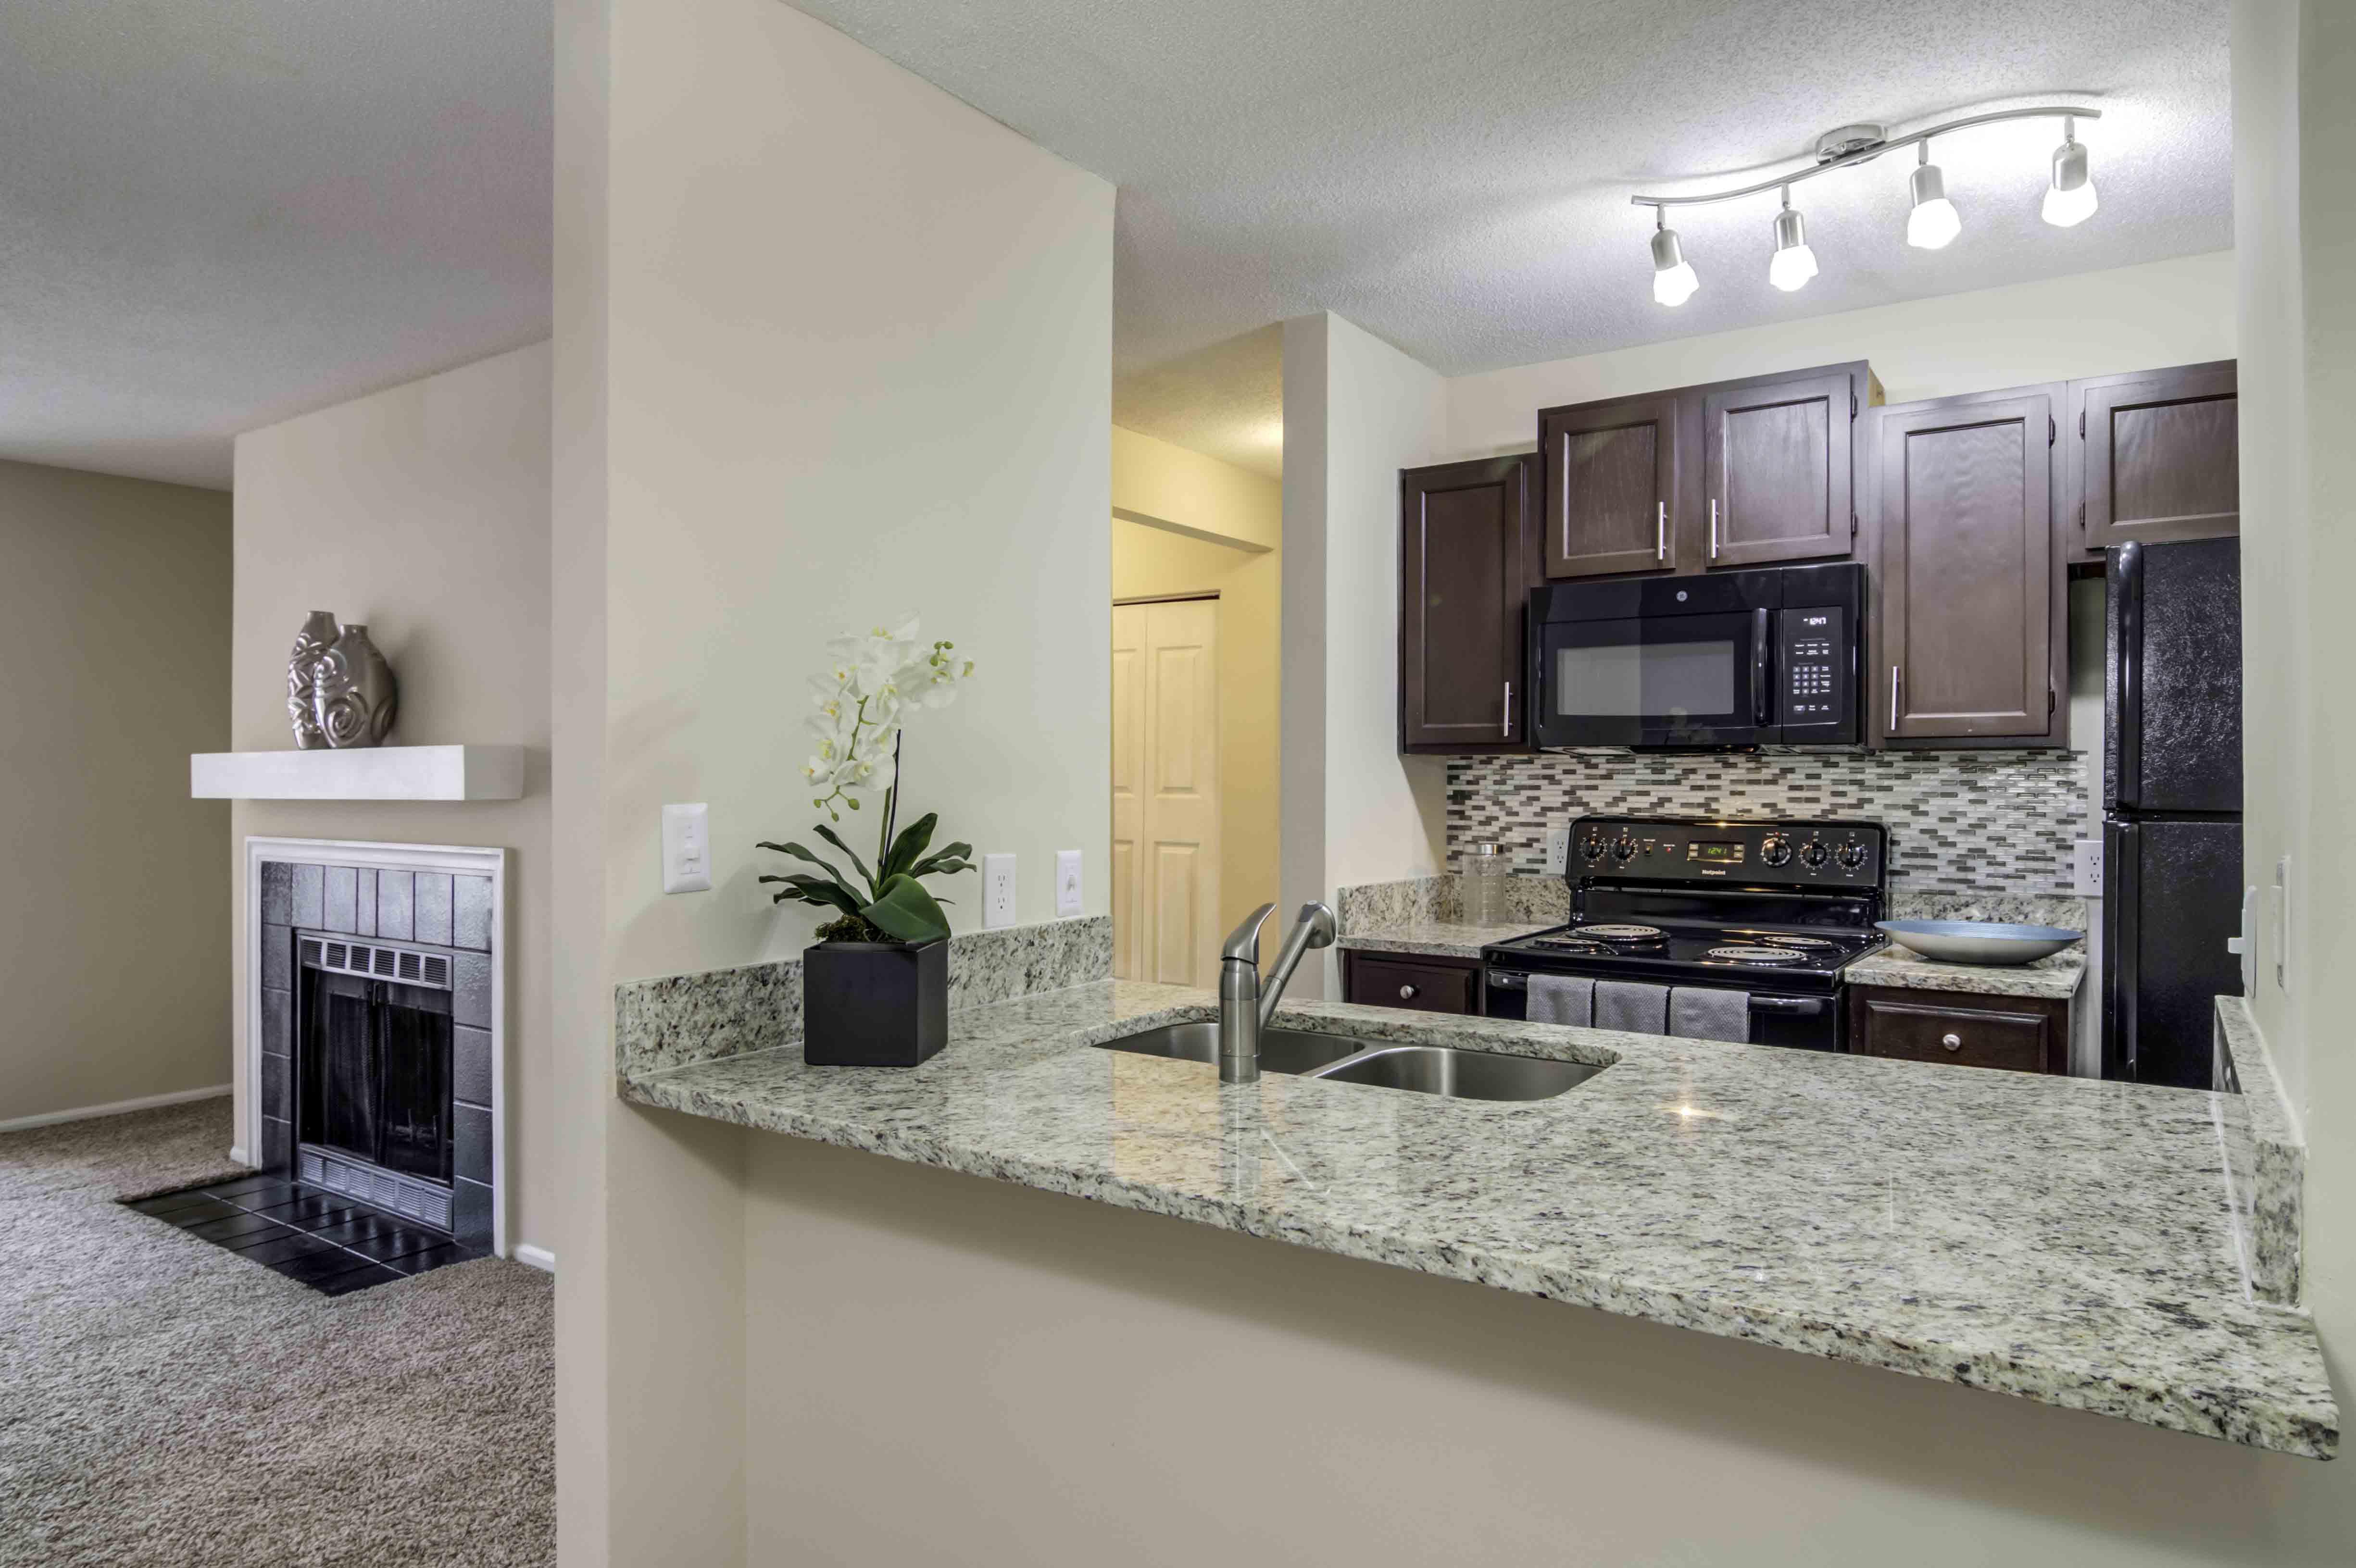 Wood Pointe Apartments rental